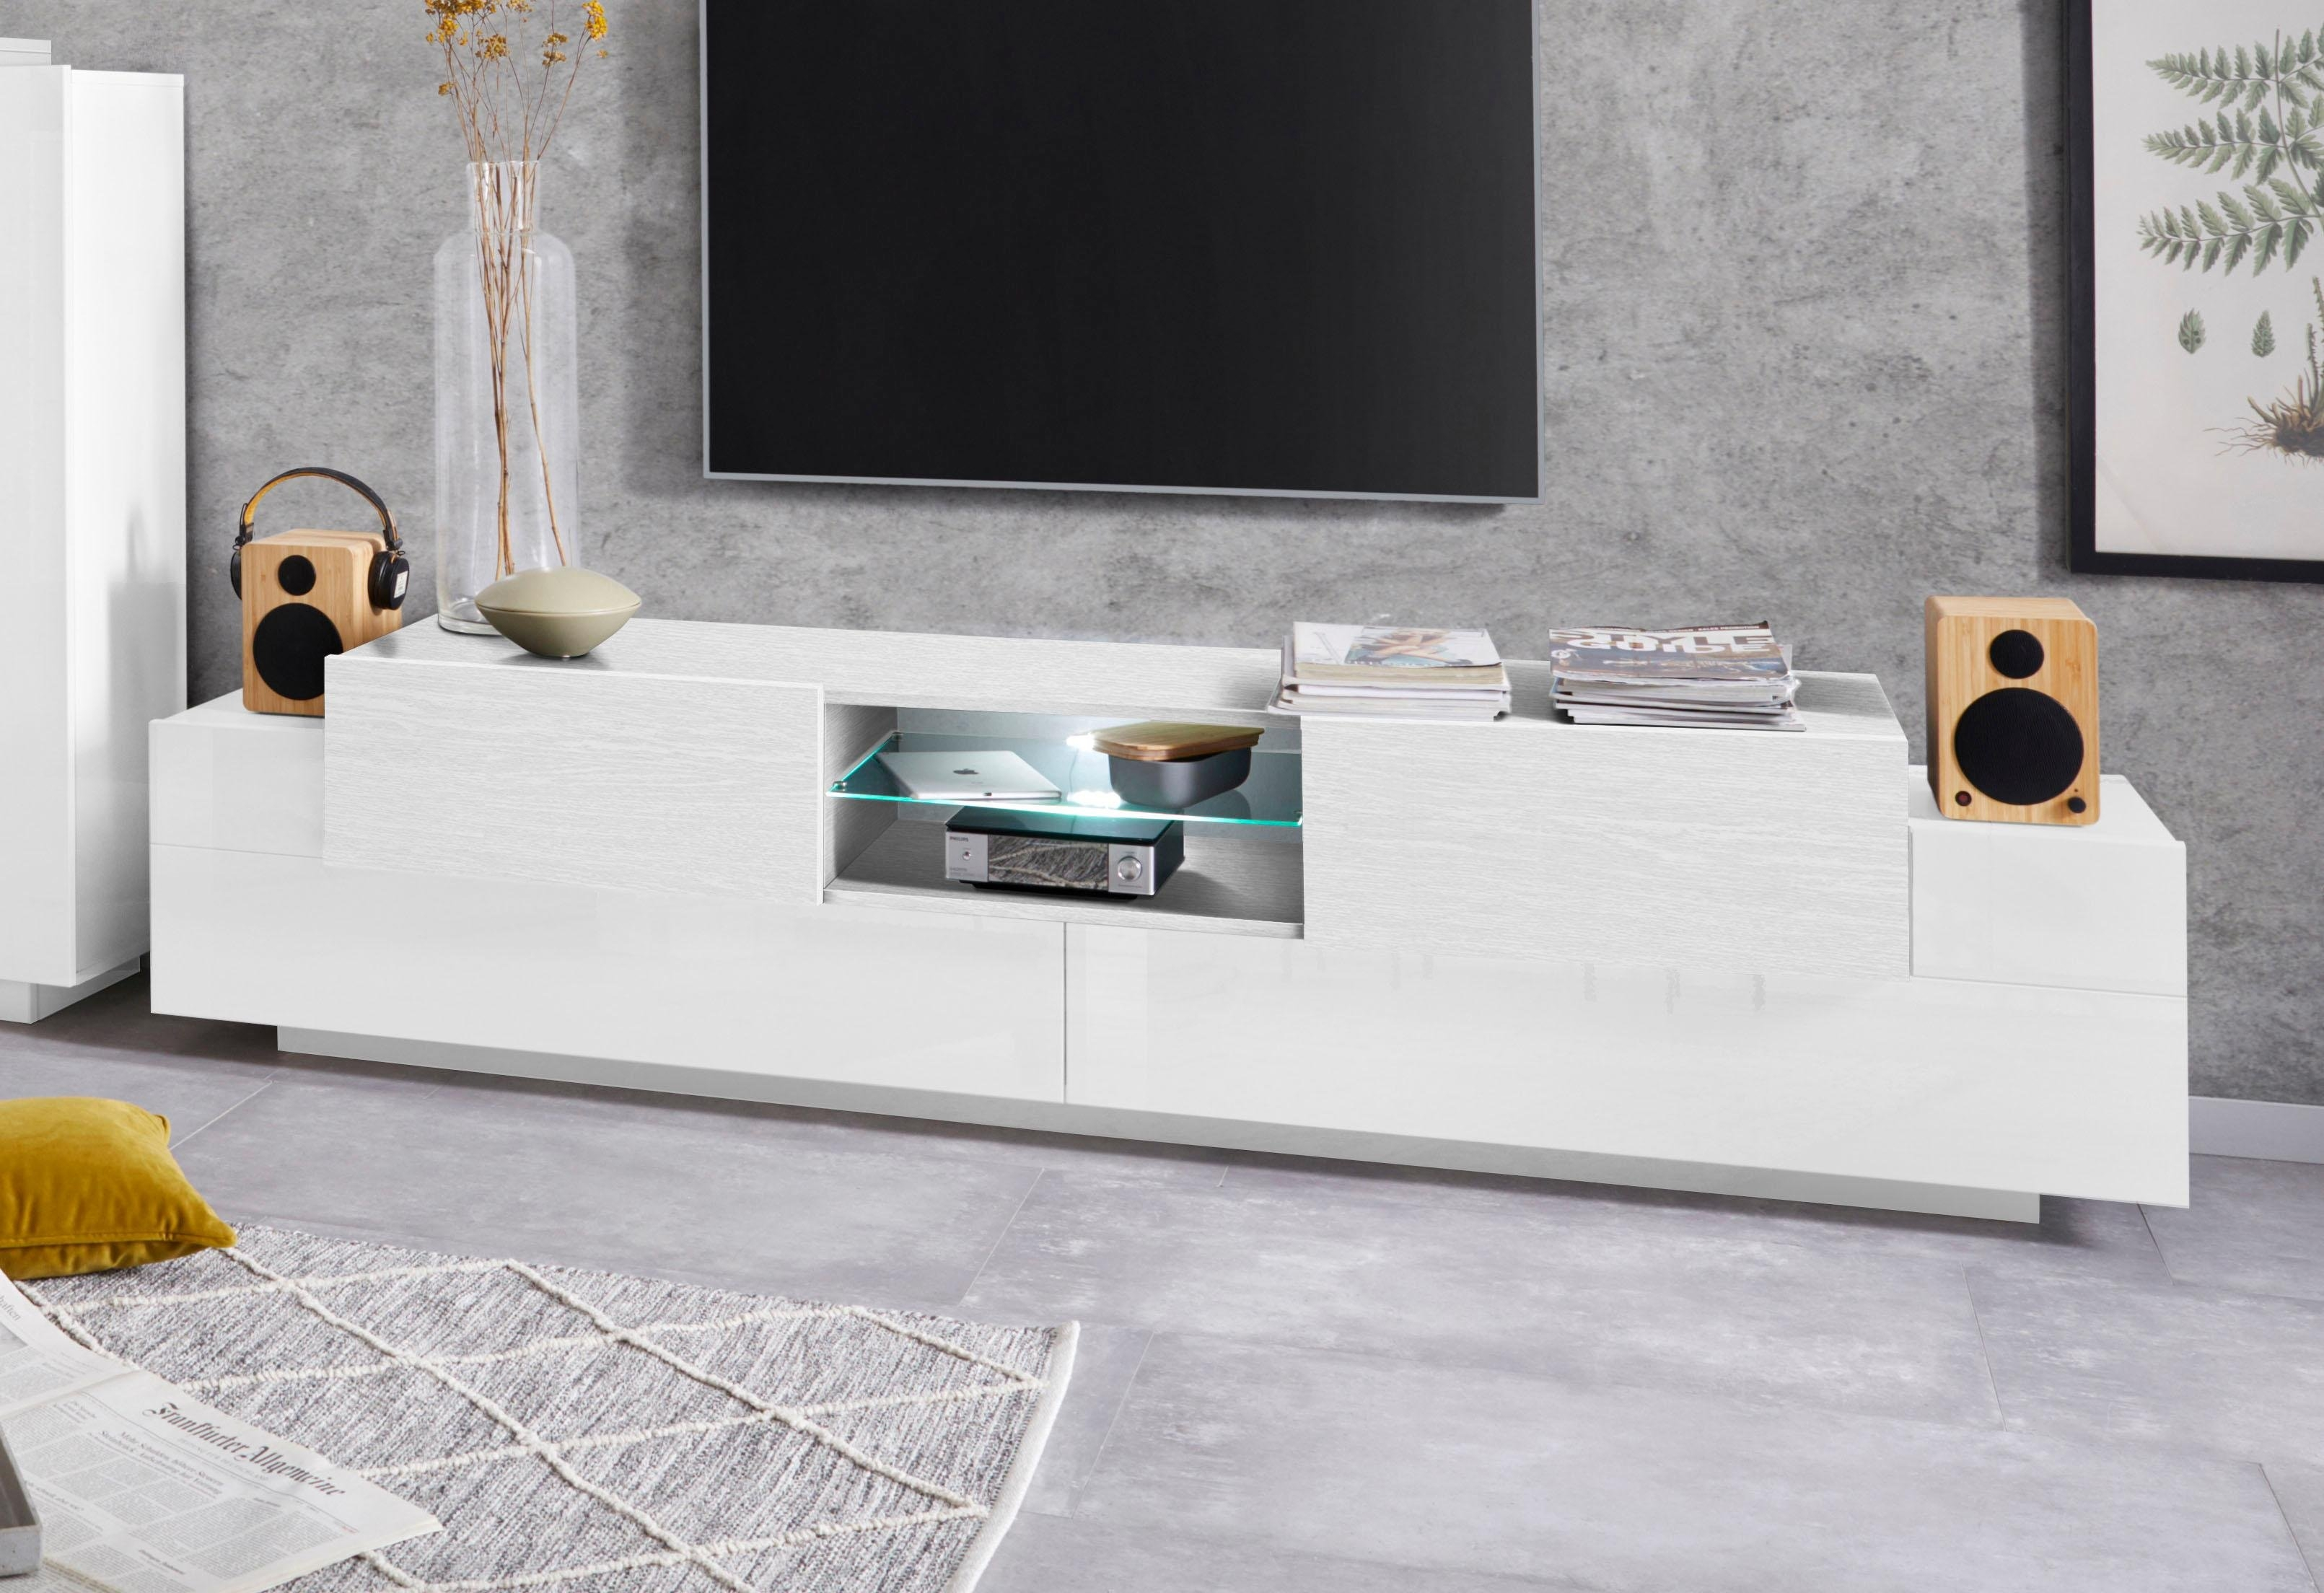 Tecnos tv-meubel Coro Breedte 220 cm - verschillende betaalmethodes